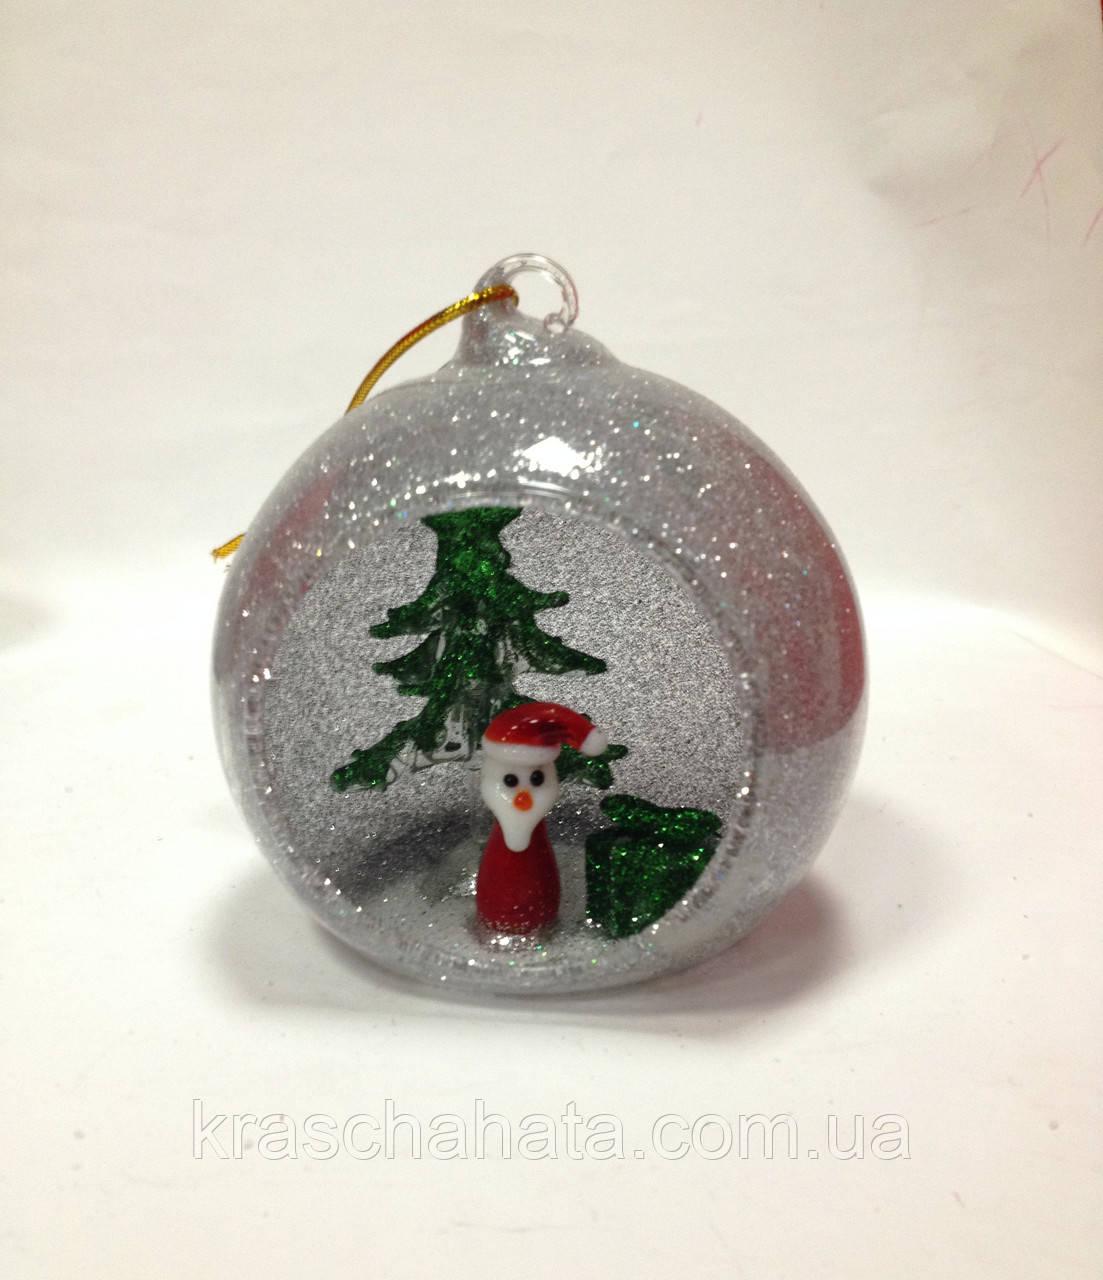 Шар новогодний, 8,5 см, декоративное стекло, сувенир новогодний, Днепропетровск